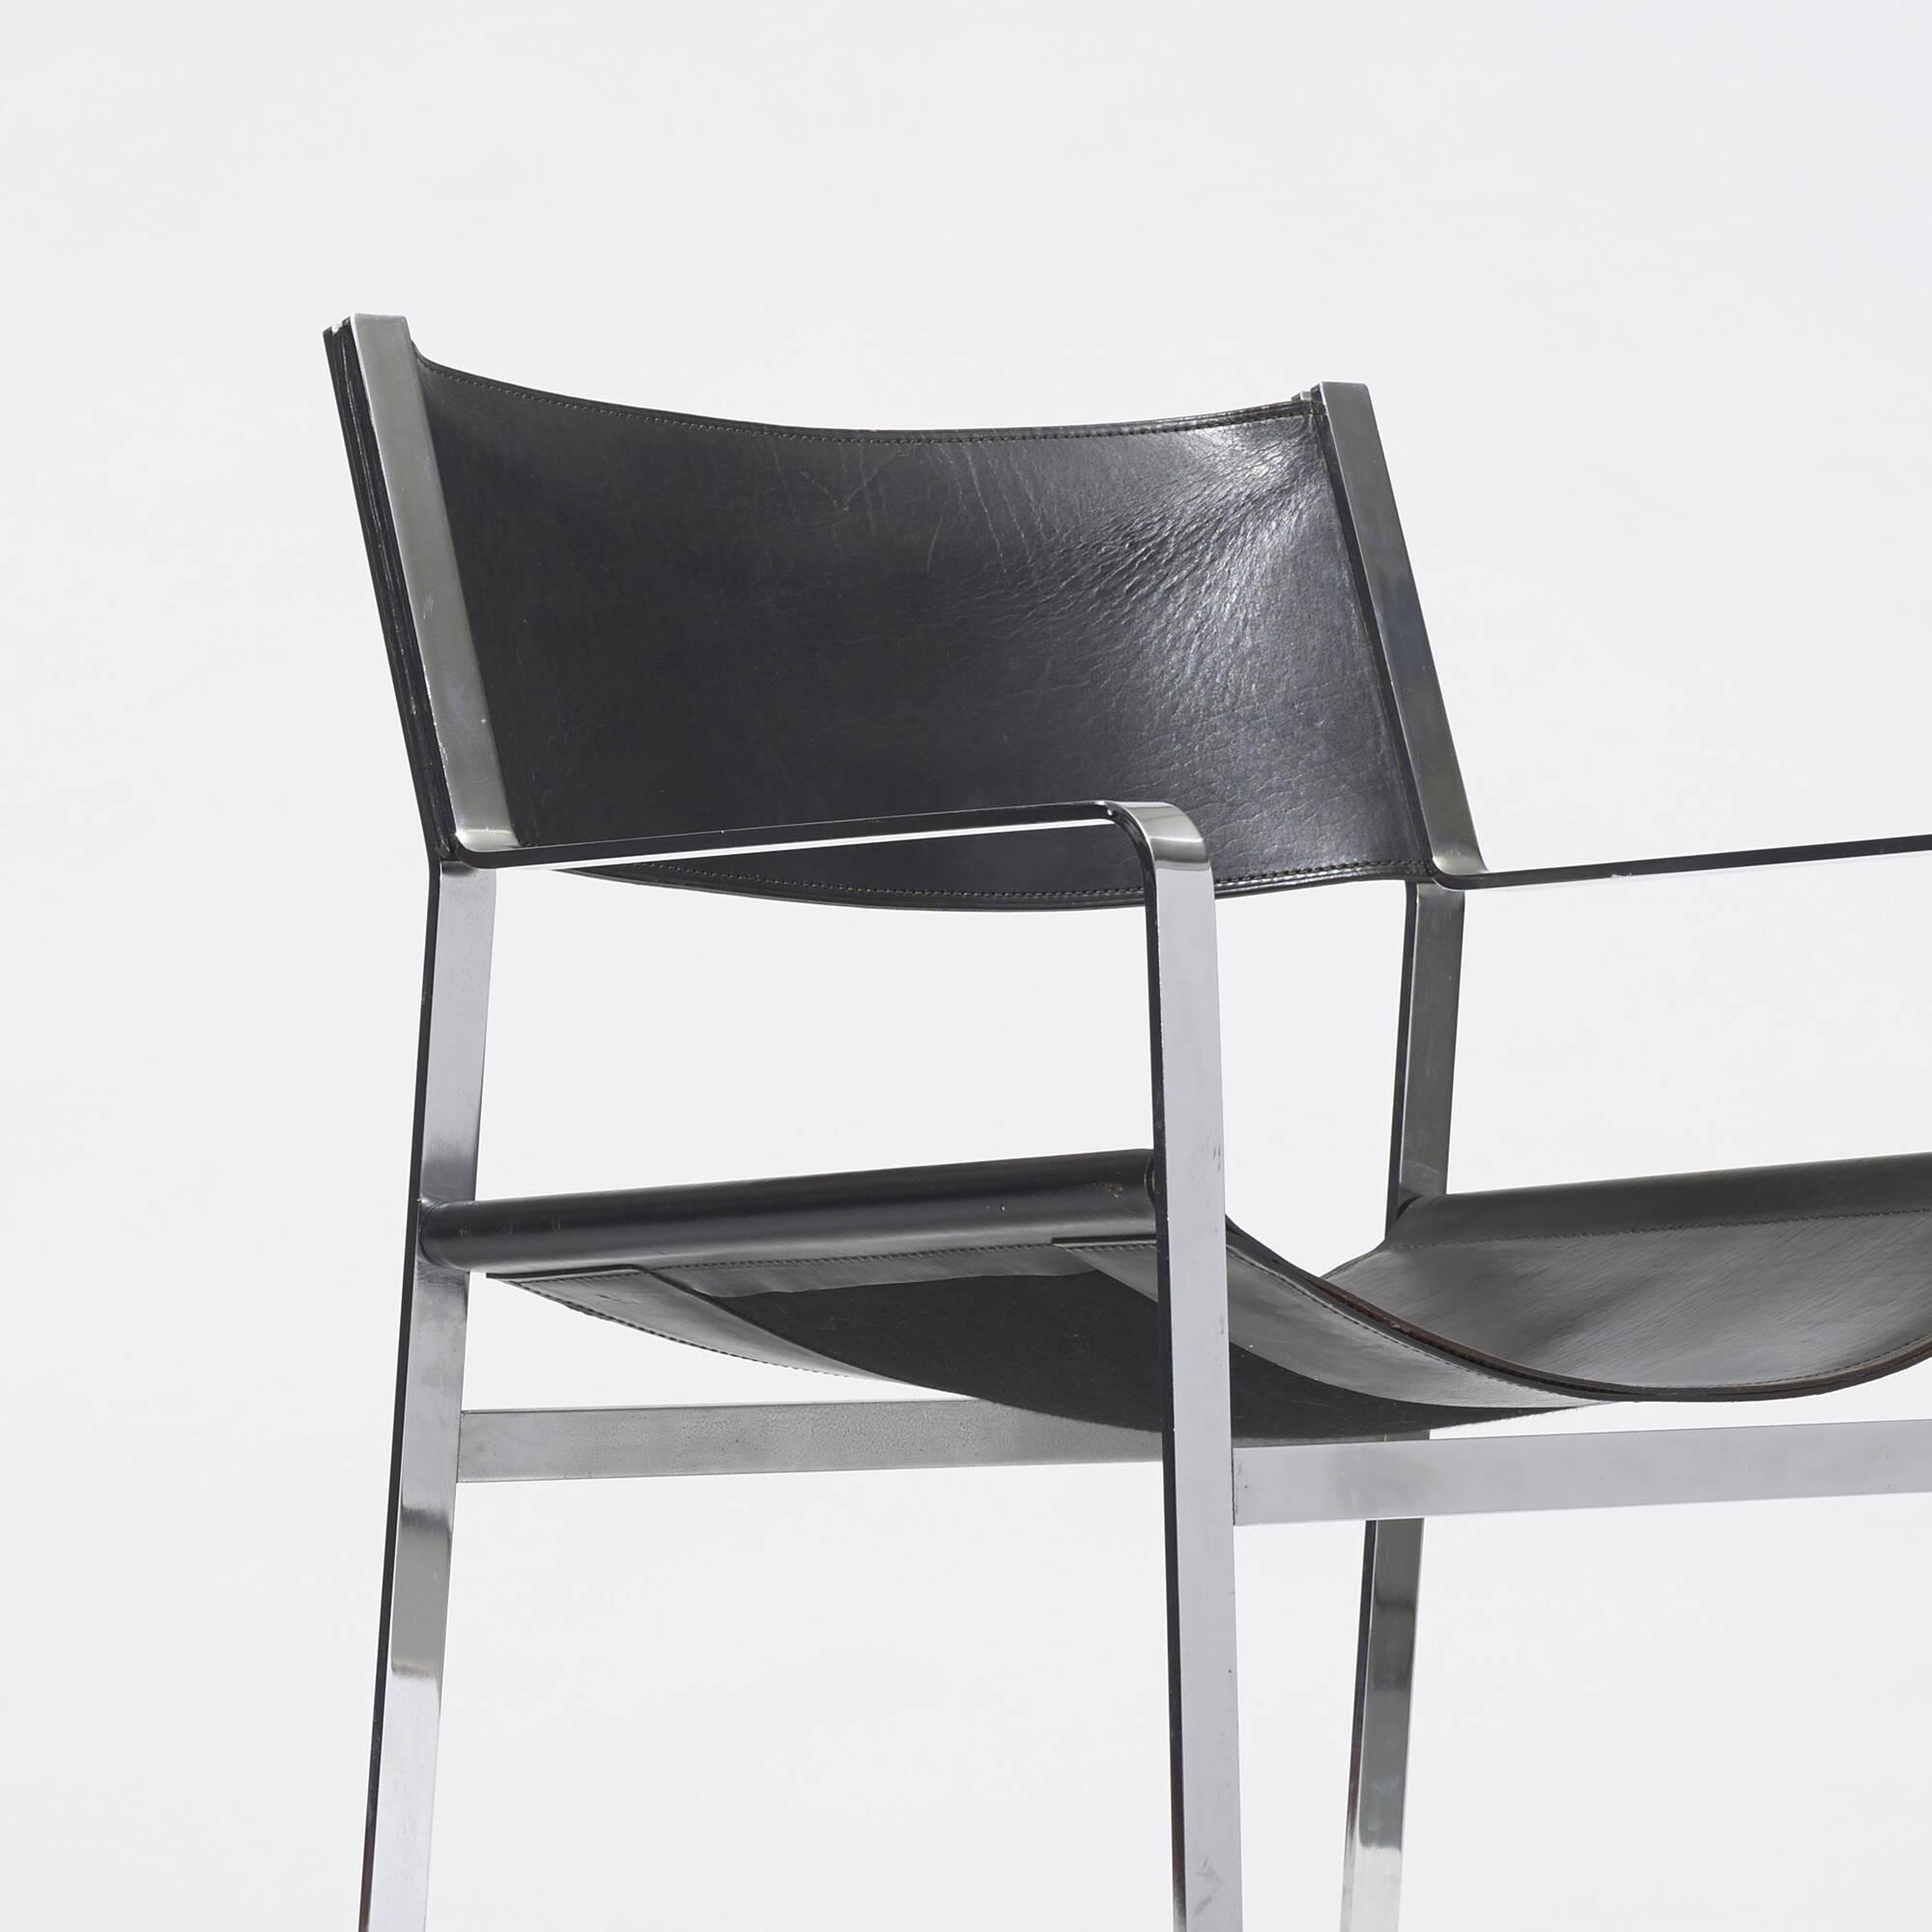 341: Hans J. Wegner / armchair, model JH812 (3 of 3)